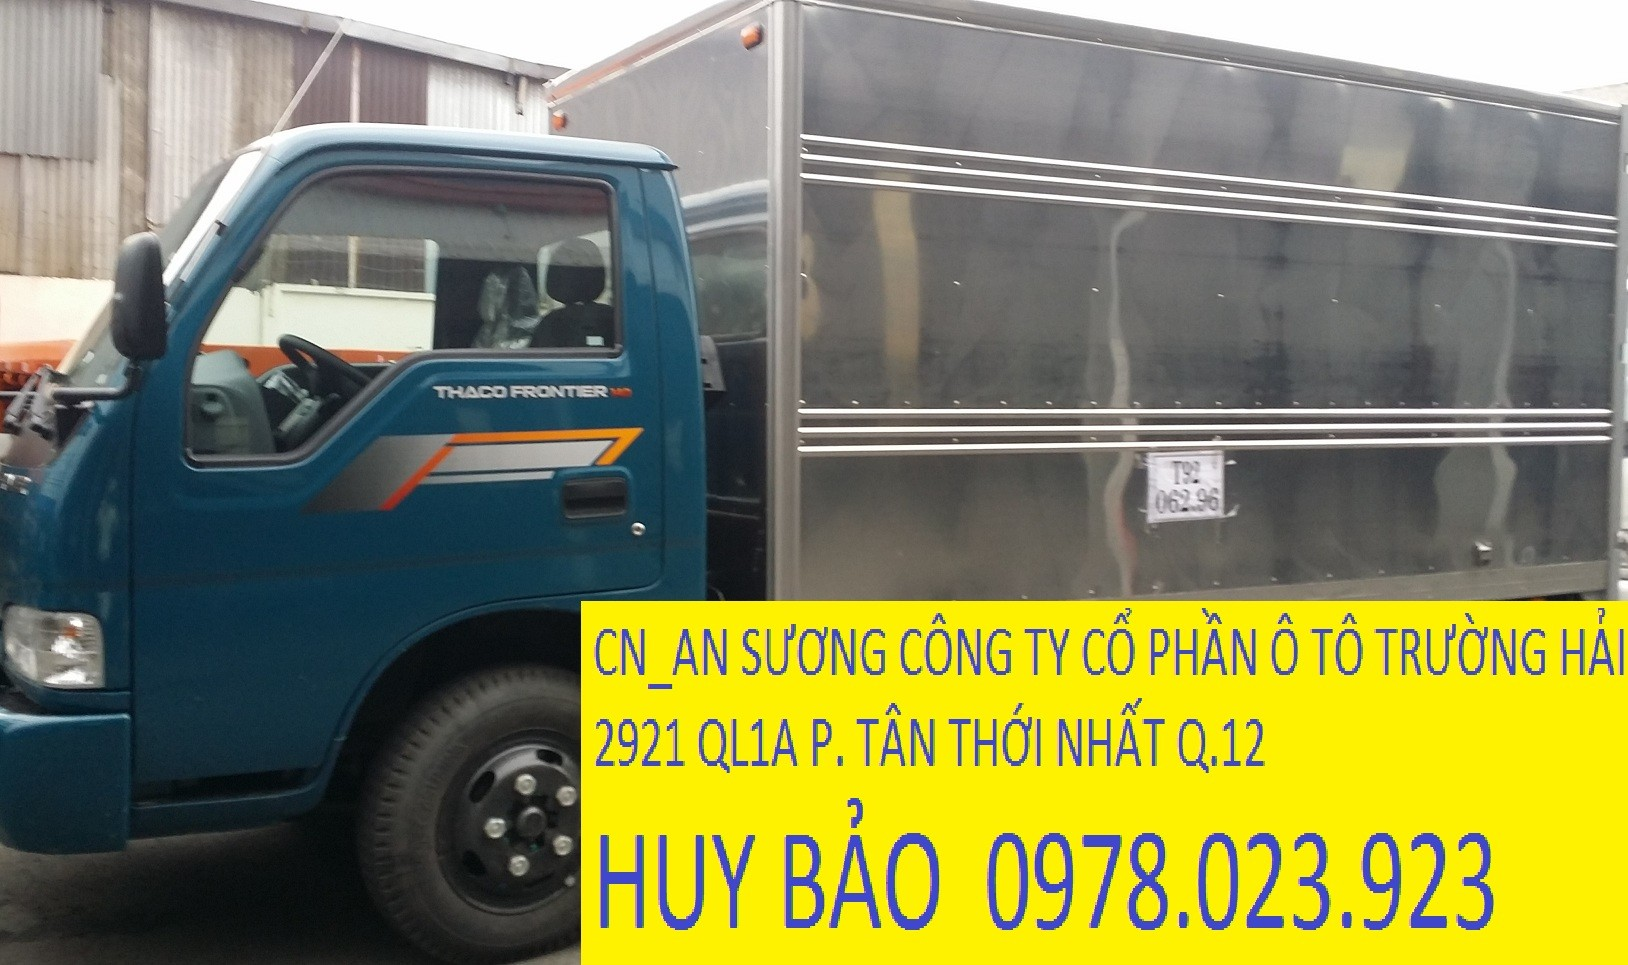 Xe tải 2,4 tấn trả góp, xe tải kia 2 tấn 4 trả góp, xe tải 1,4 tấn trả góp, xe tải 1.4 tấn trả góp 85% Ảnh số 41042667